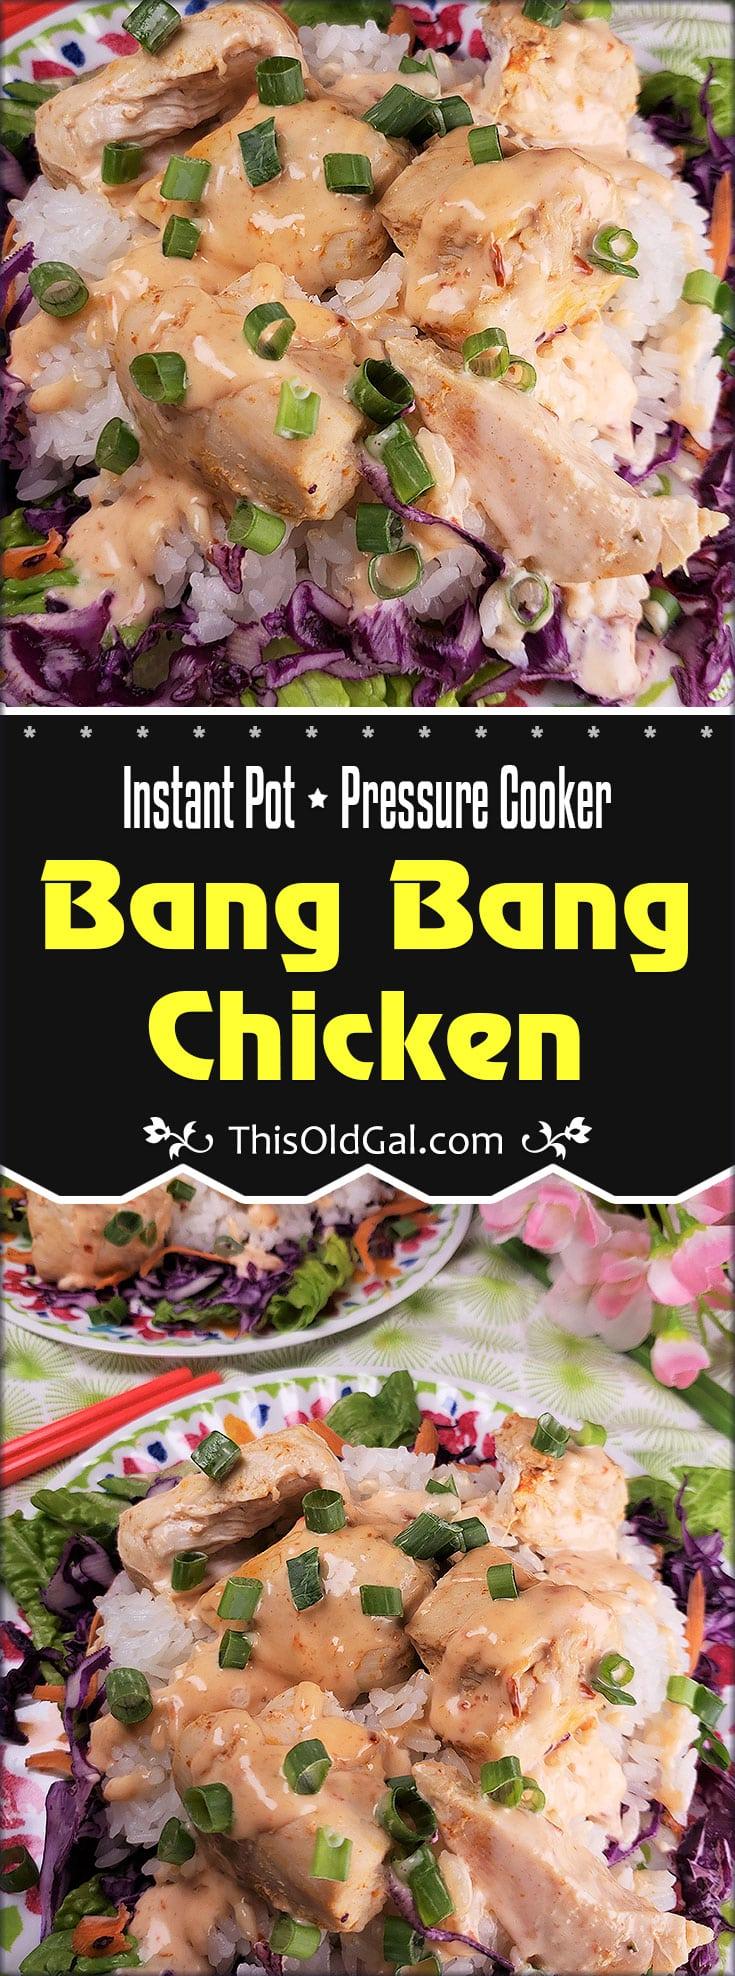 Instant Pot Pressure Cooker Bang Bang Chicken